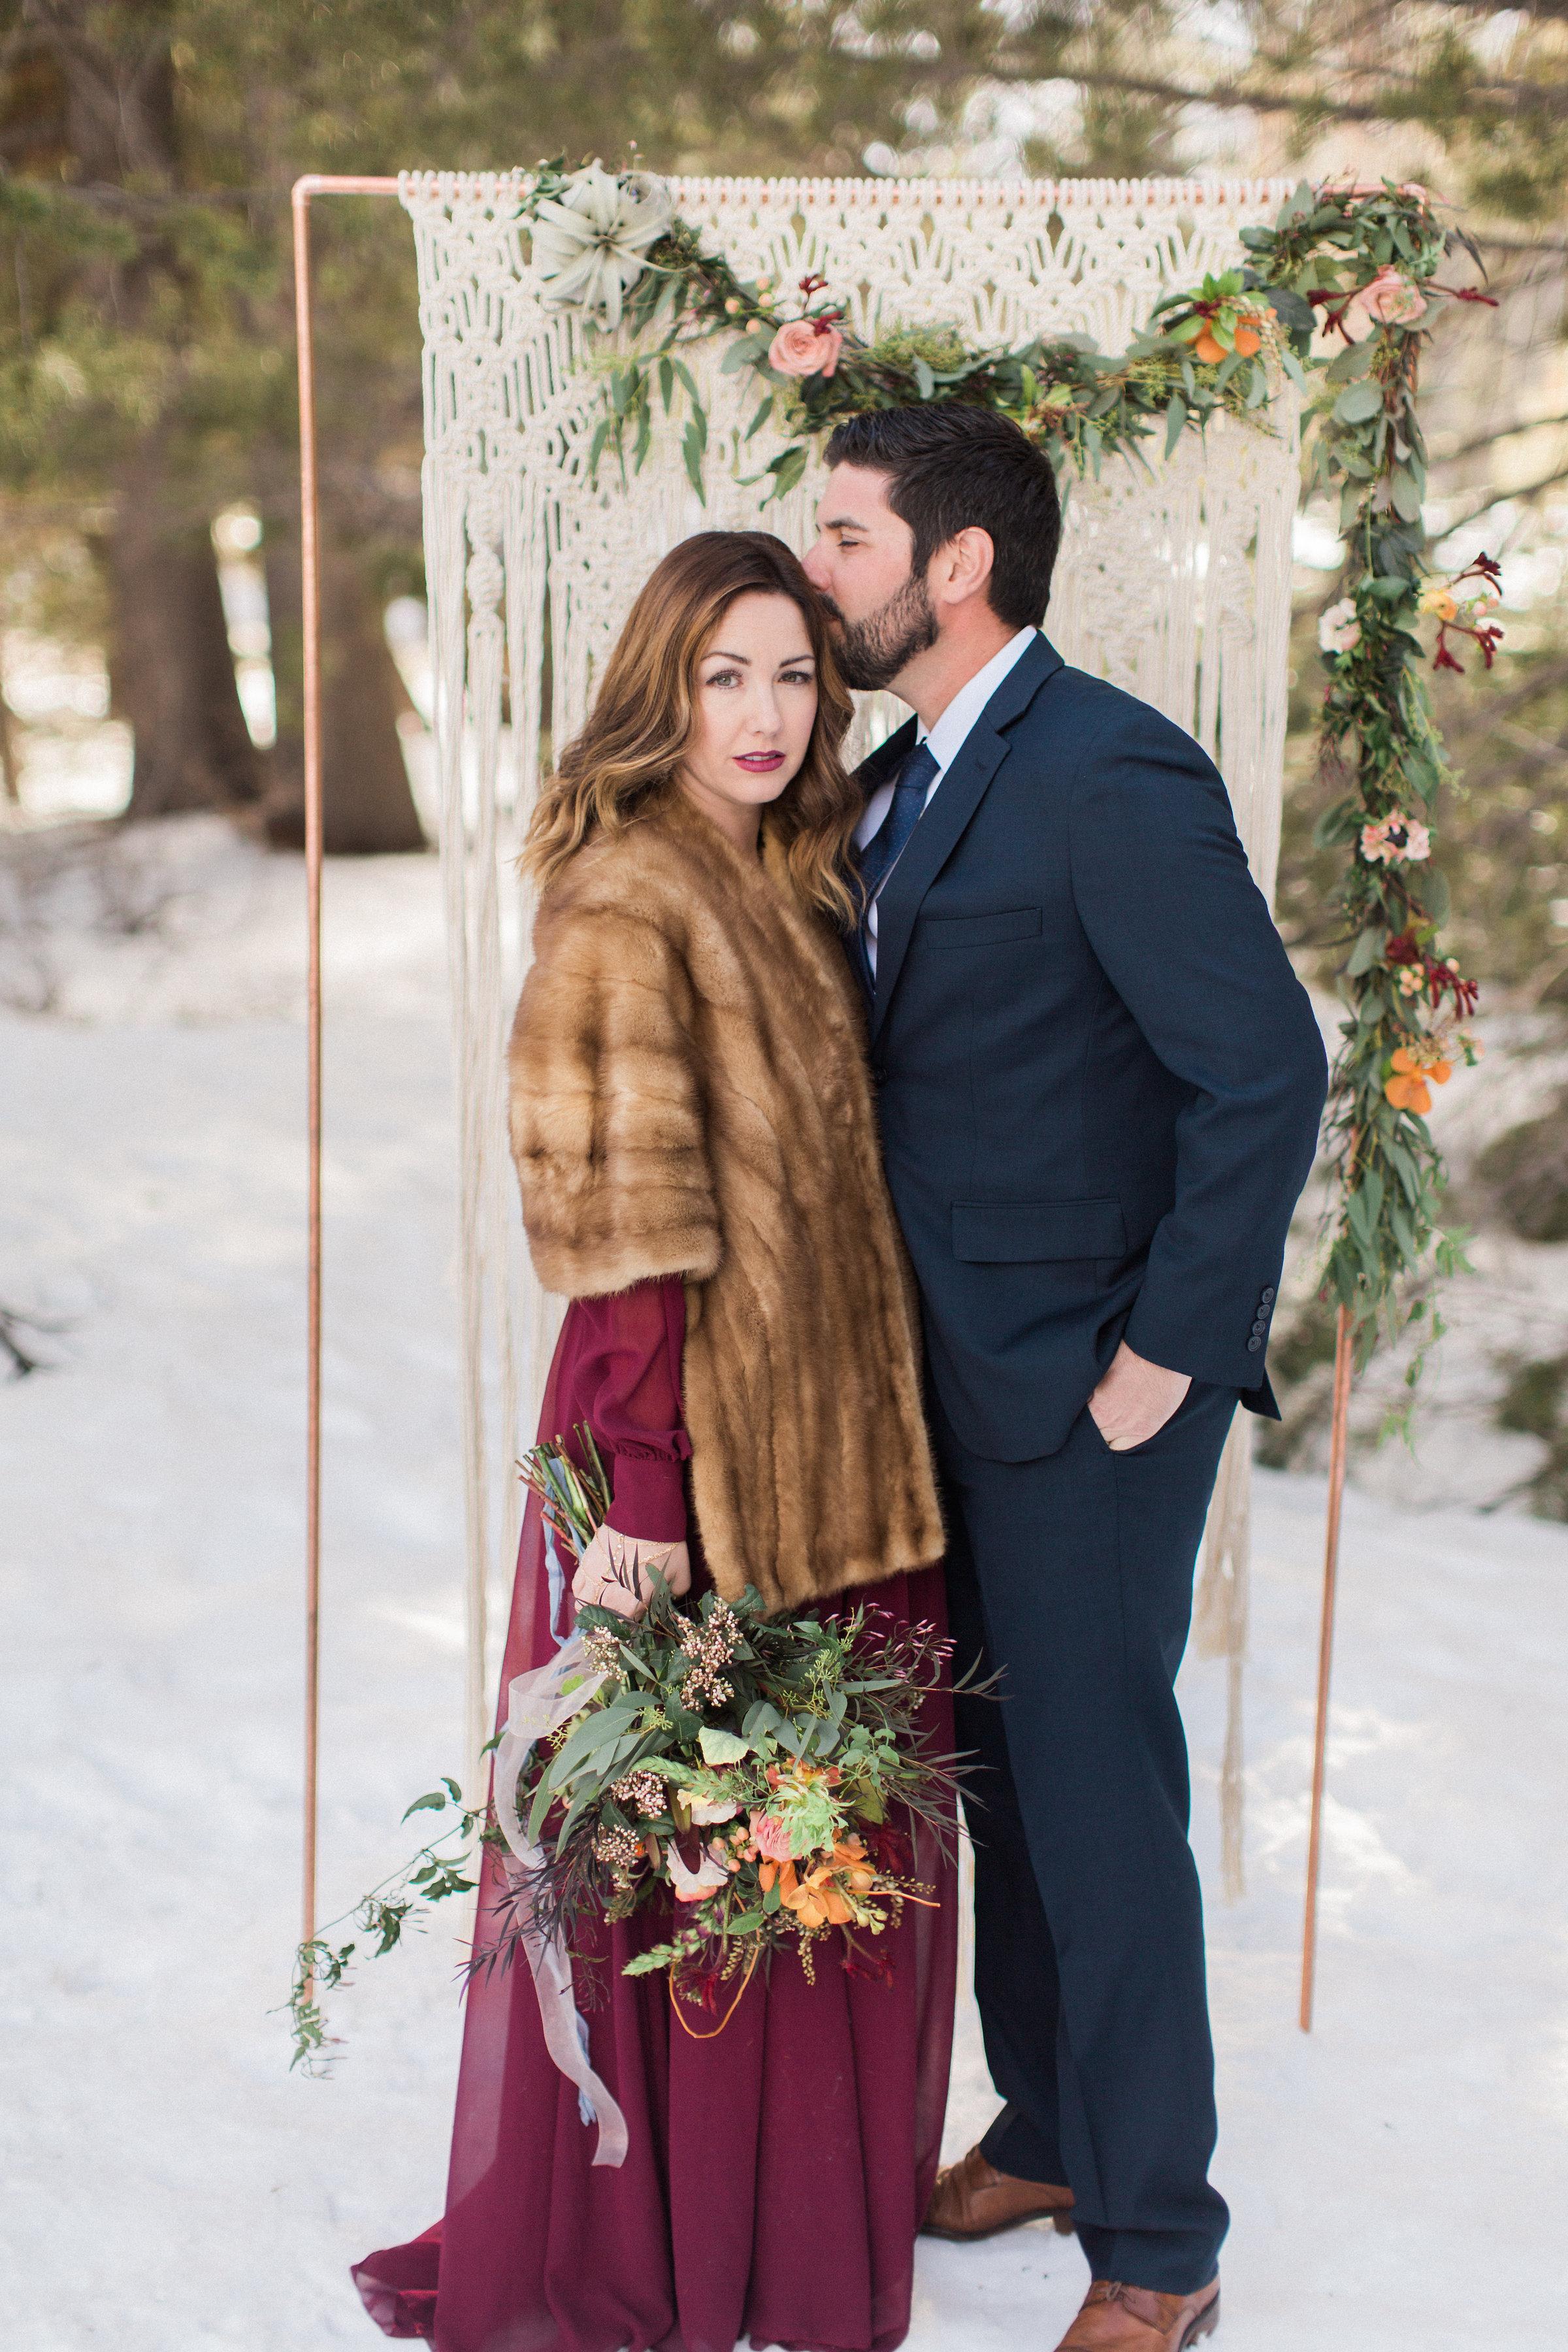 A Winter Engagement